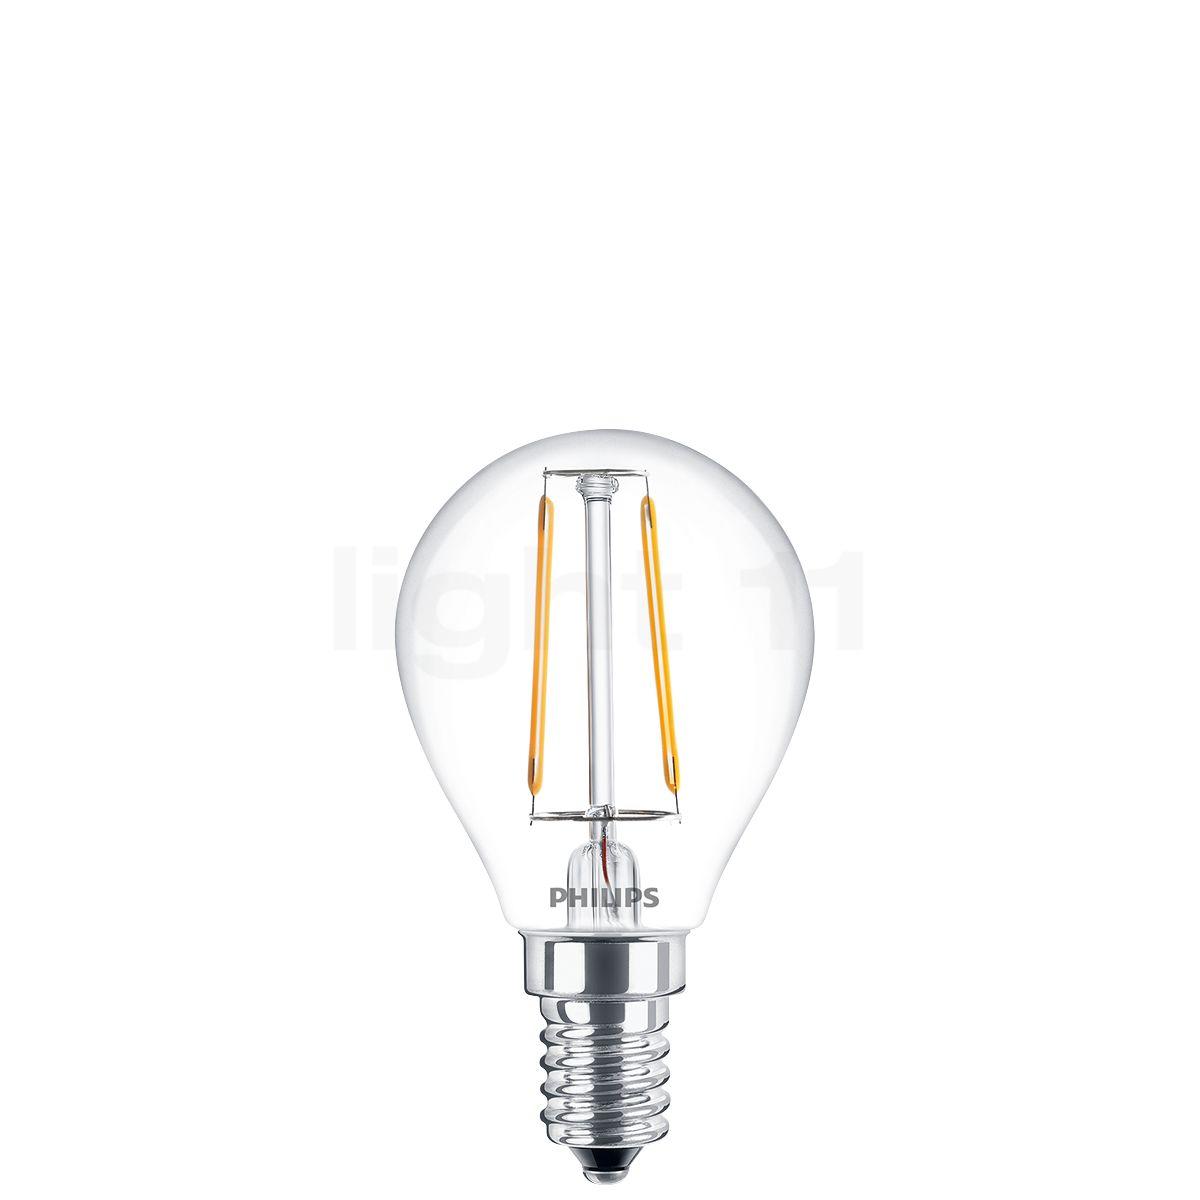 philips d45 2 3w  c 827  e14 filament led